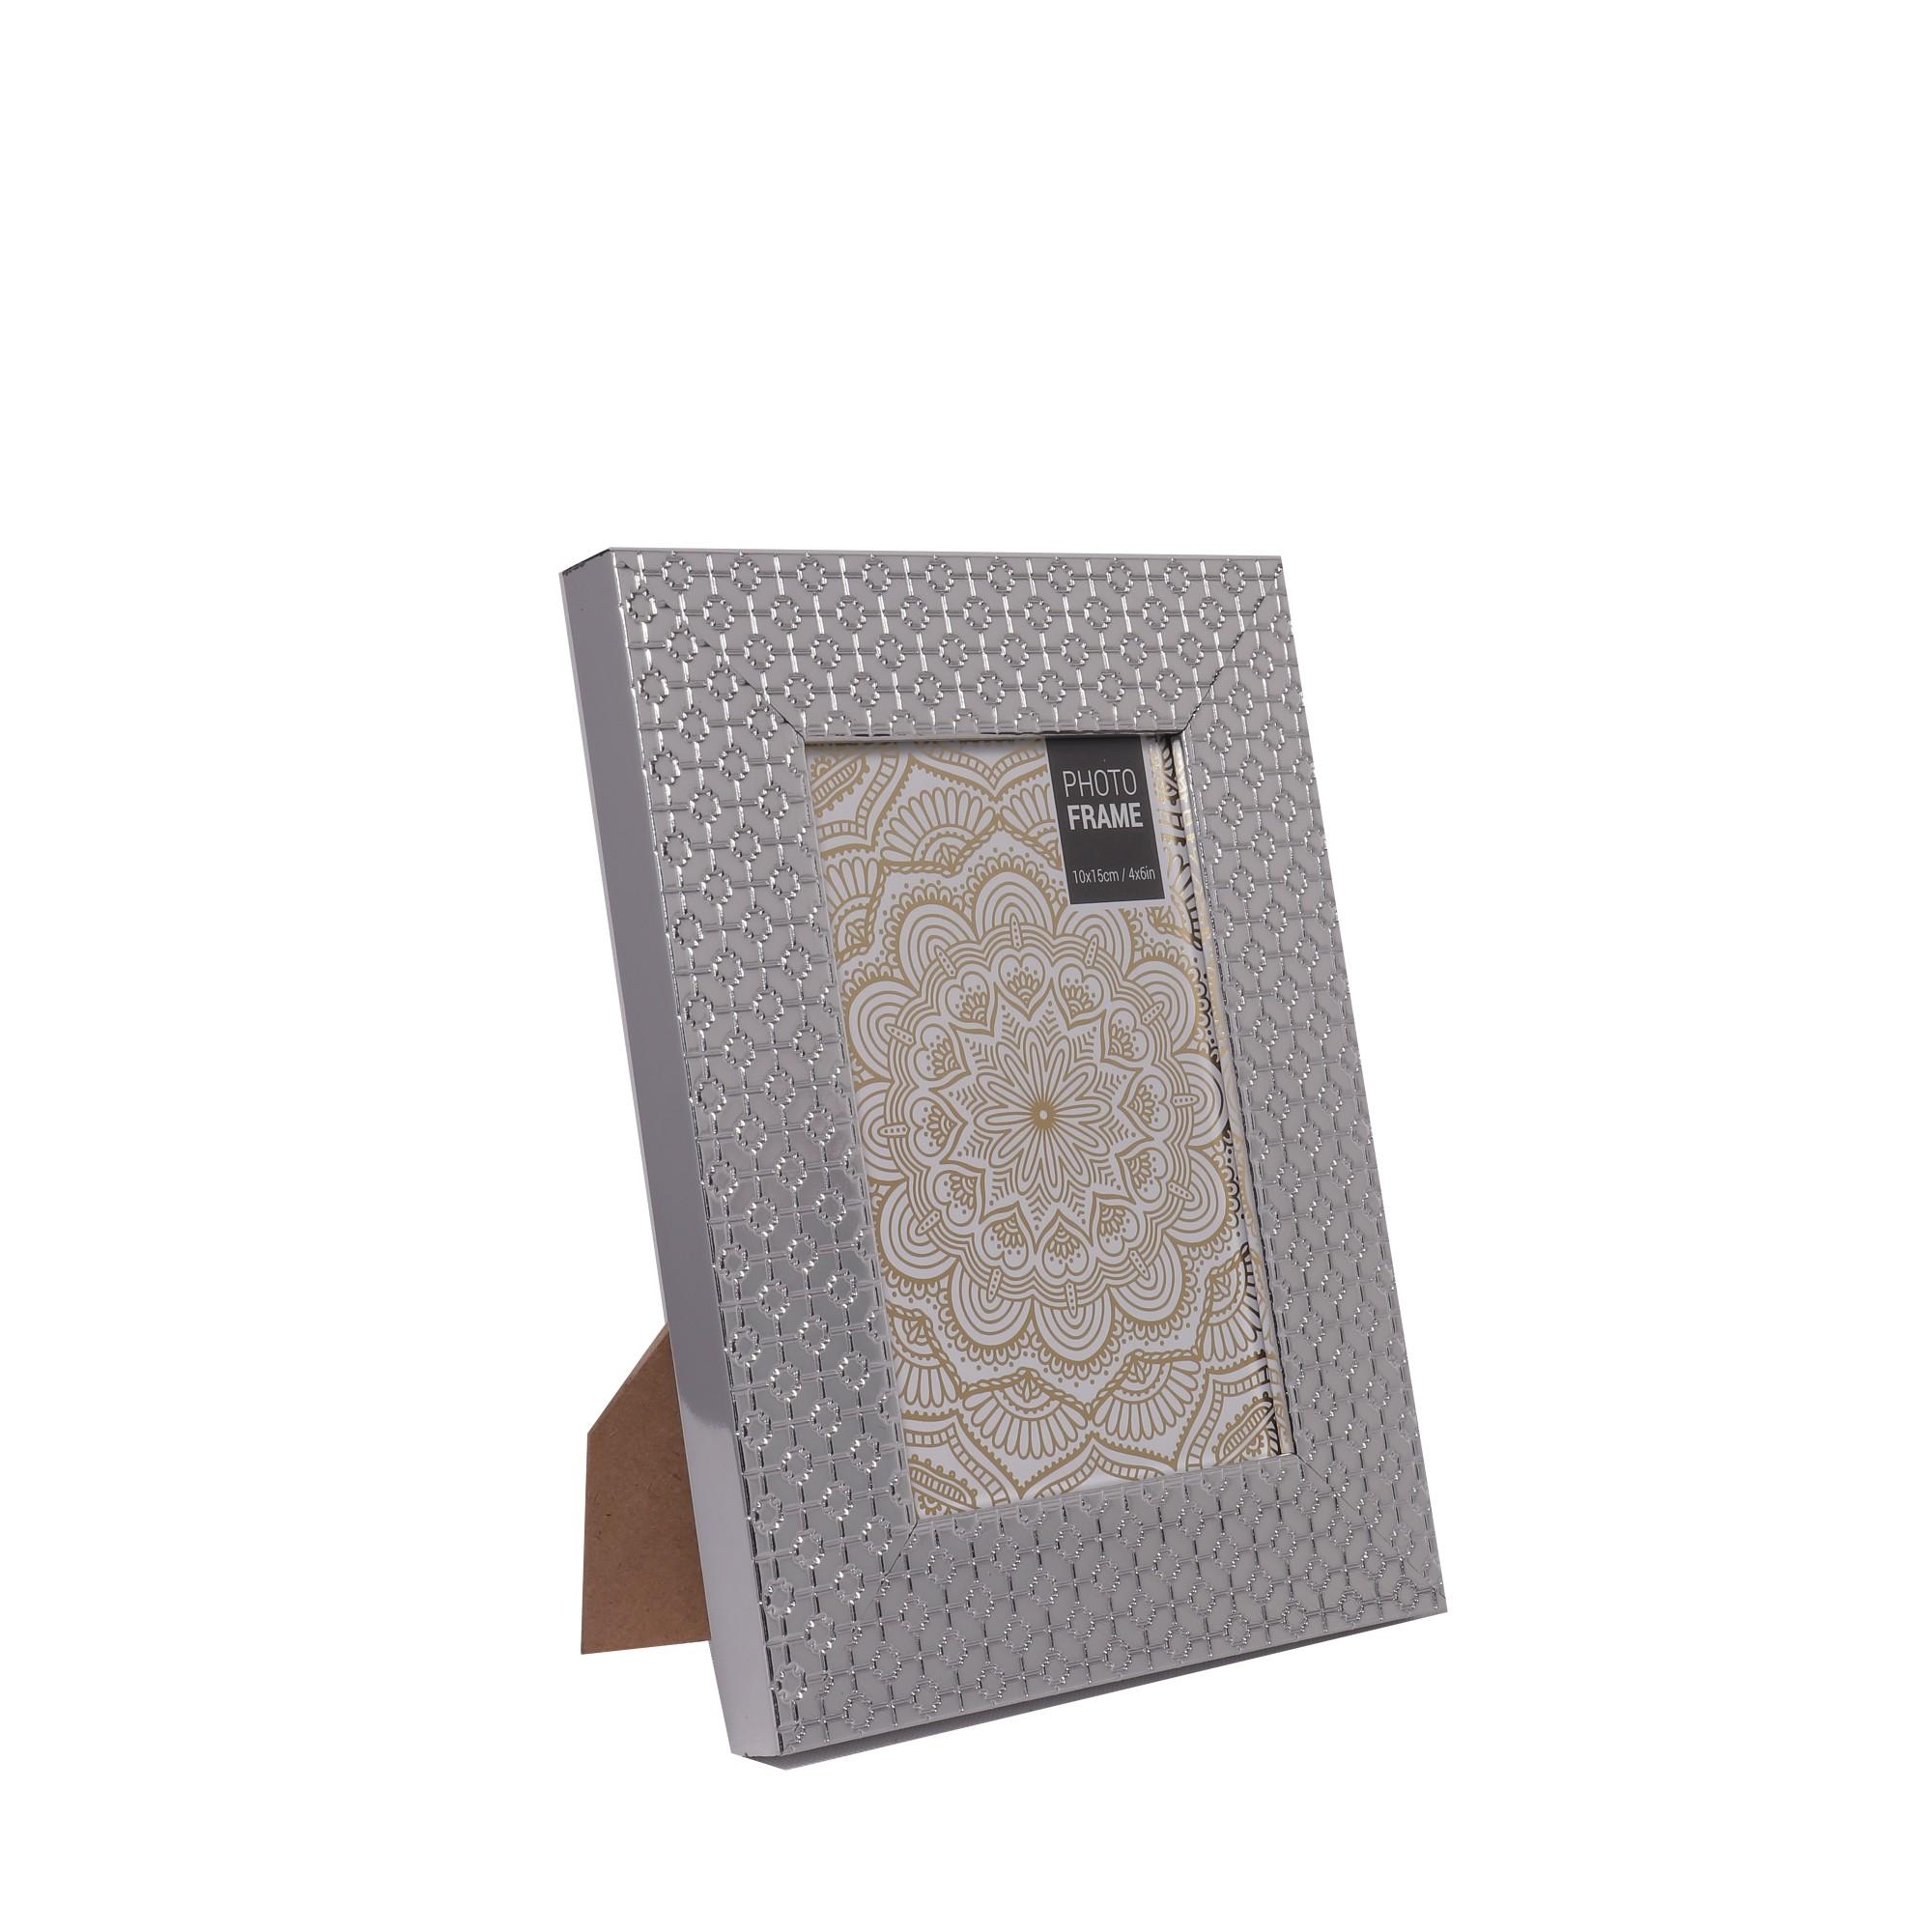 Porta Retrato Unifoto 10x15 cm Cinza 26094 - Noritex